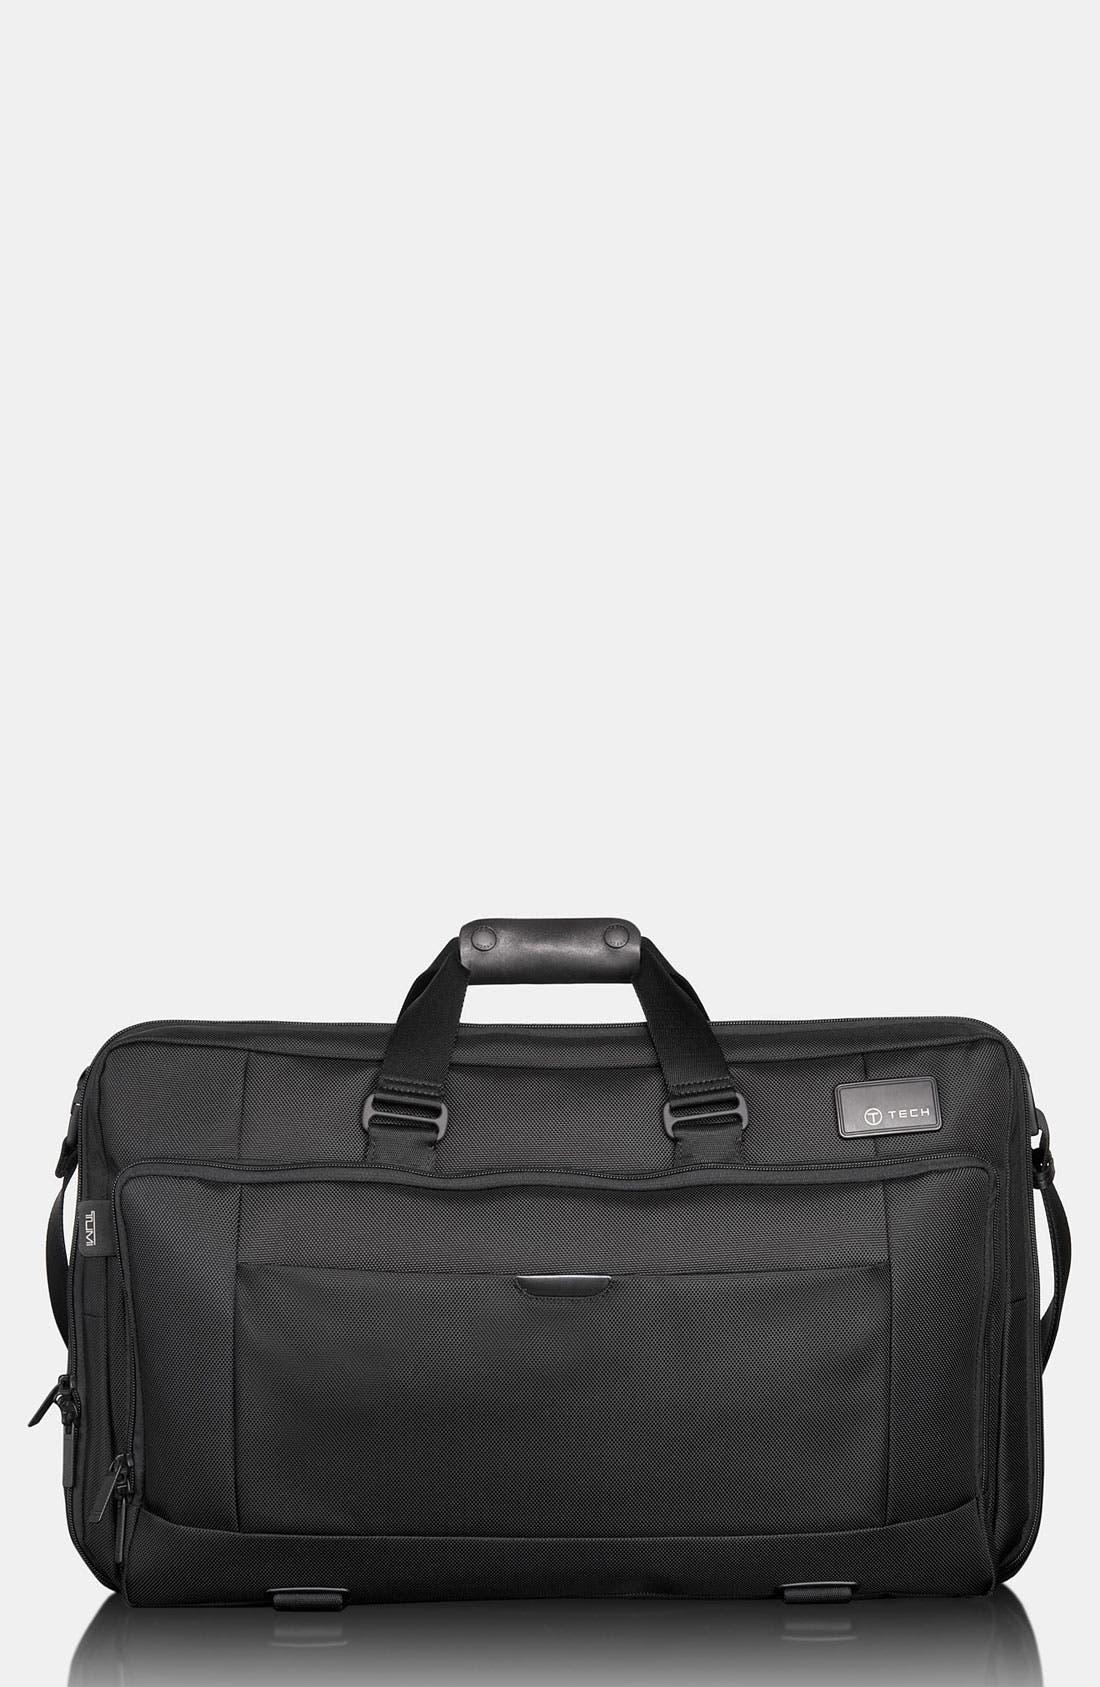 Main Image - Tumi 'T-Tech Network' Trifold Garment Bag